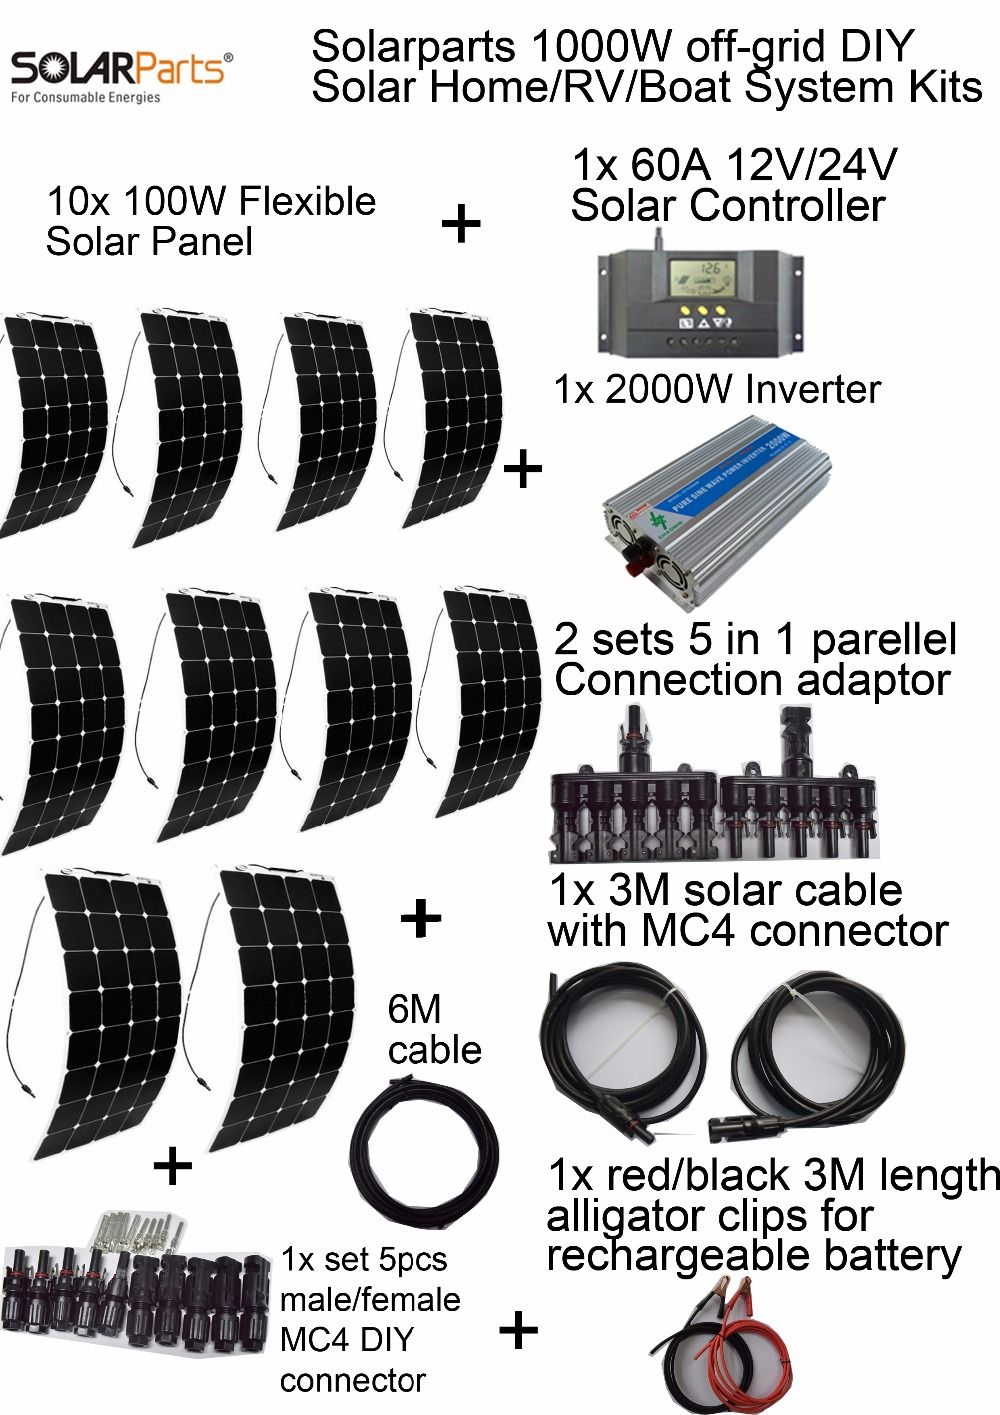 Goedkope Solarparts Off Grid Zonnestelsel Kits 1000 W Flexibele Zonnepaneel 1 Stks 60a Controller 2kw Inver Flexible Solar Panels Solar System Kit Solar Panels